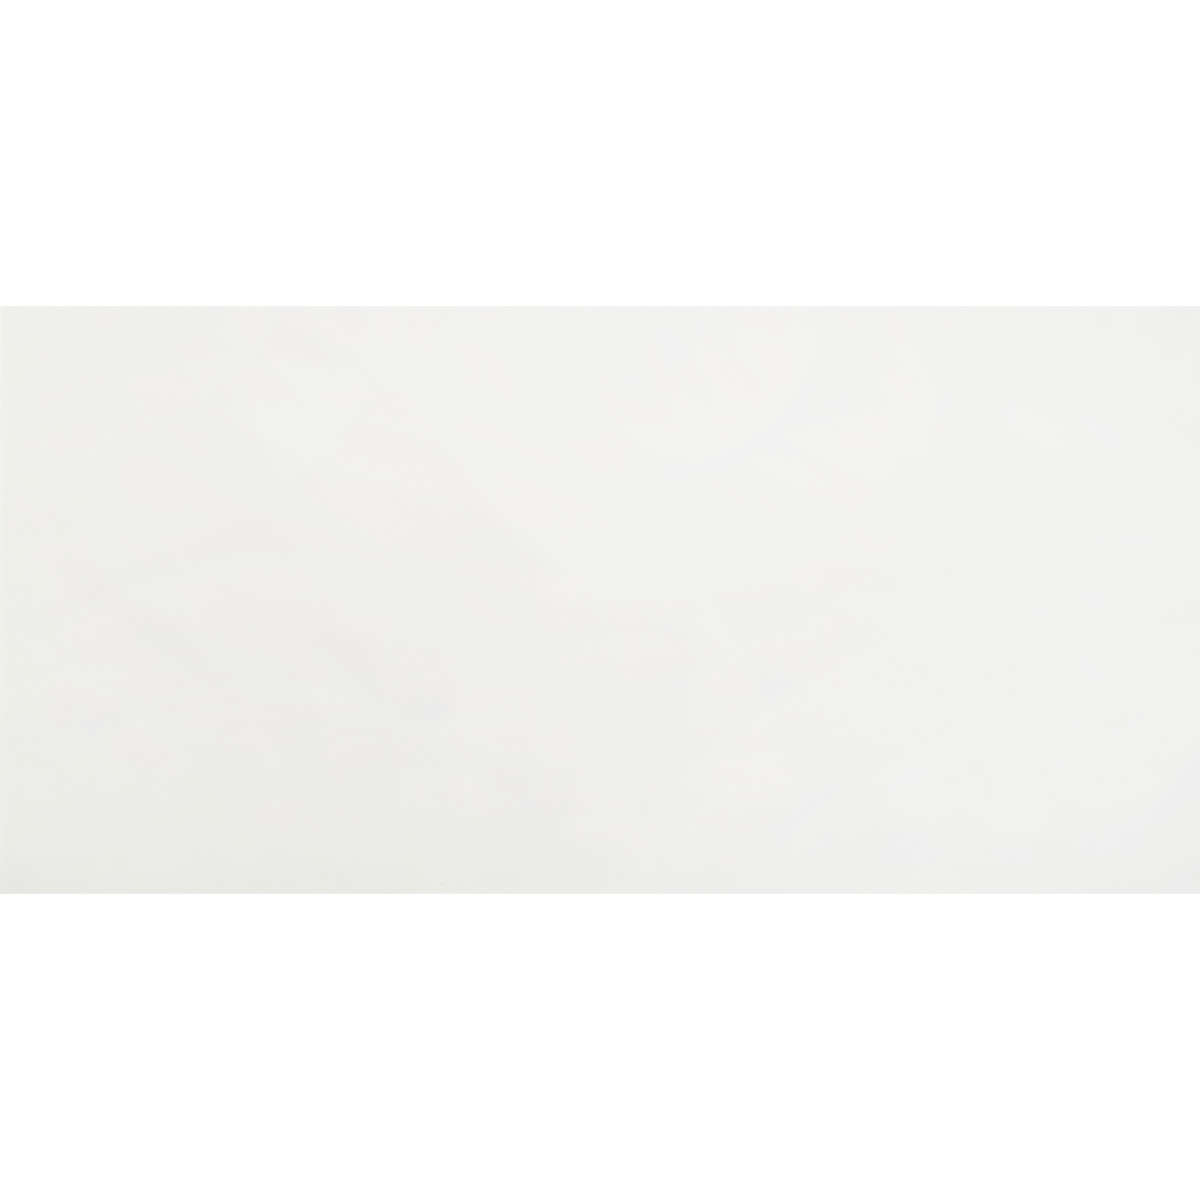 Плитка настенная Фрост 30х60 см 1.26 м² цвет белый матовый